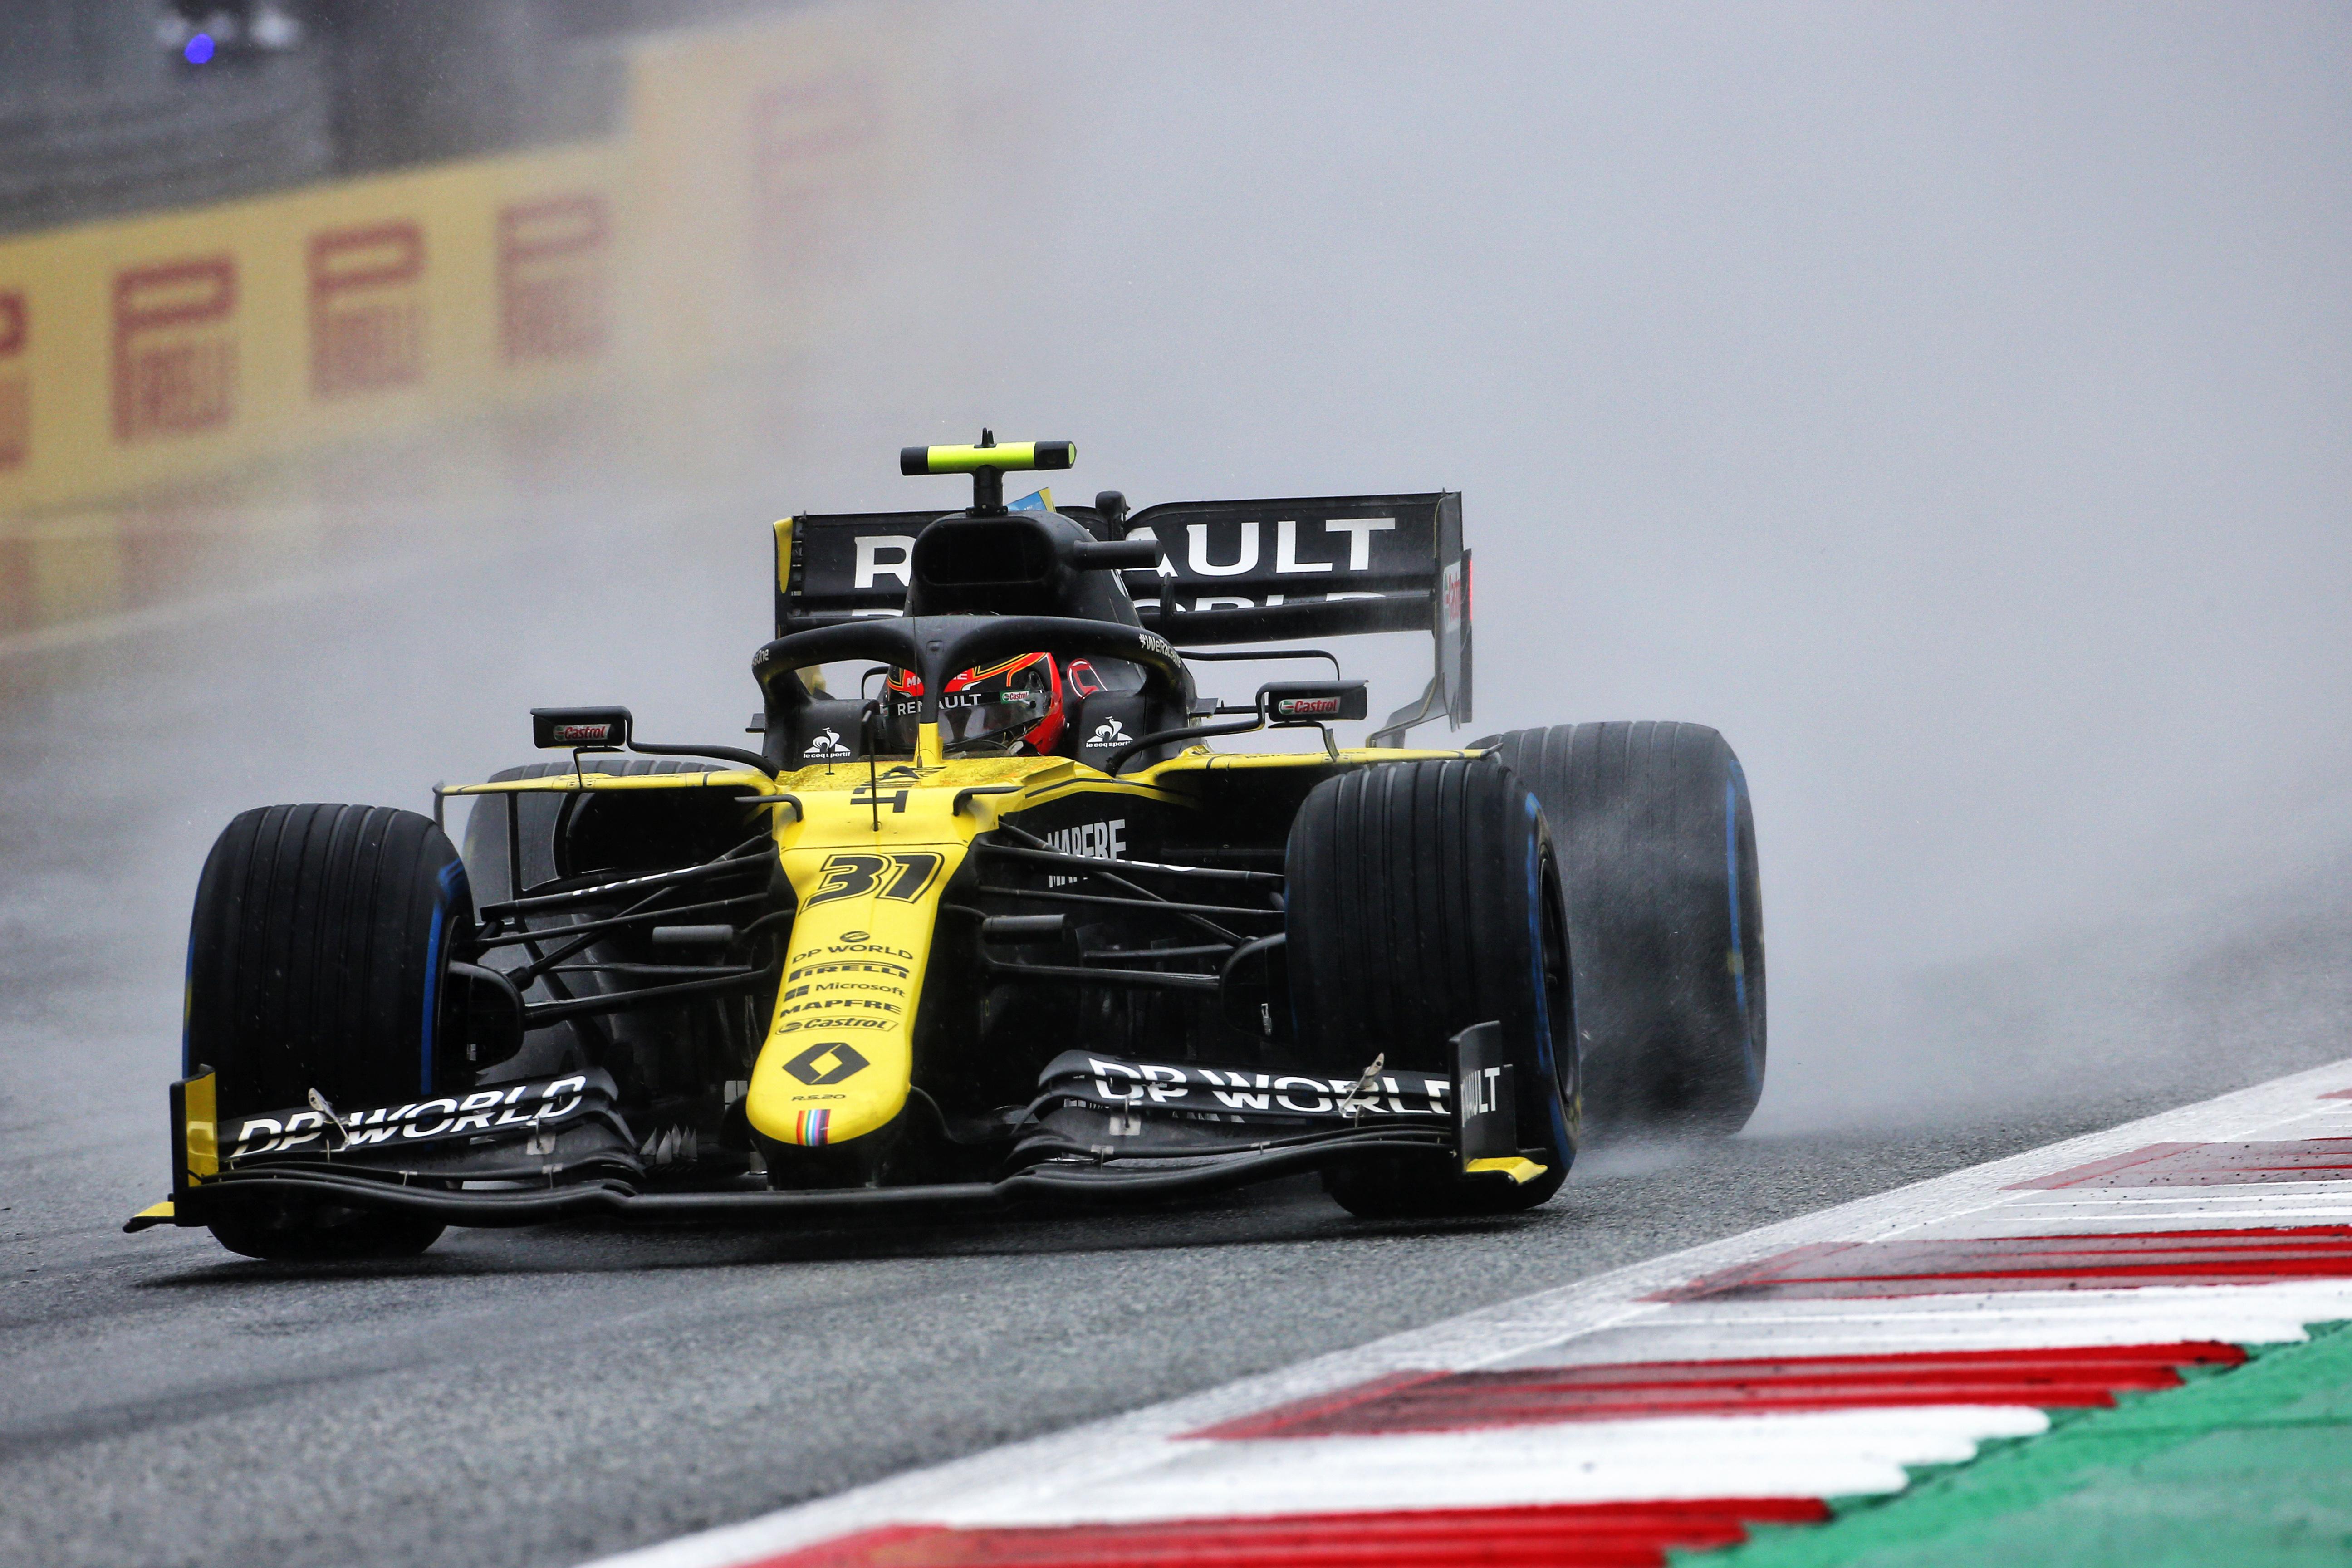 Esteban Ocon Renault Styrian Grand Prix 2020